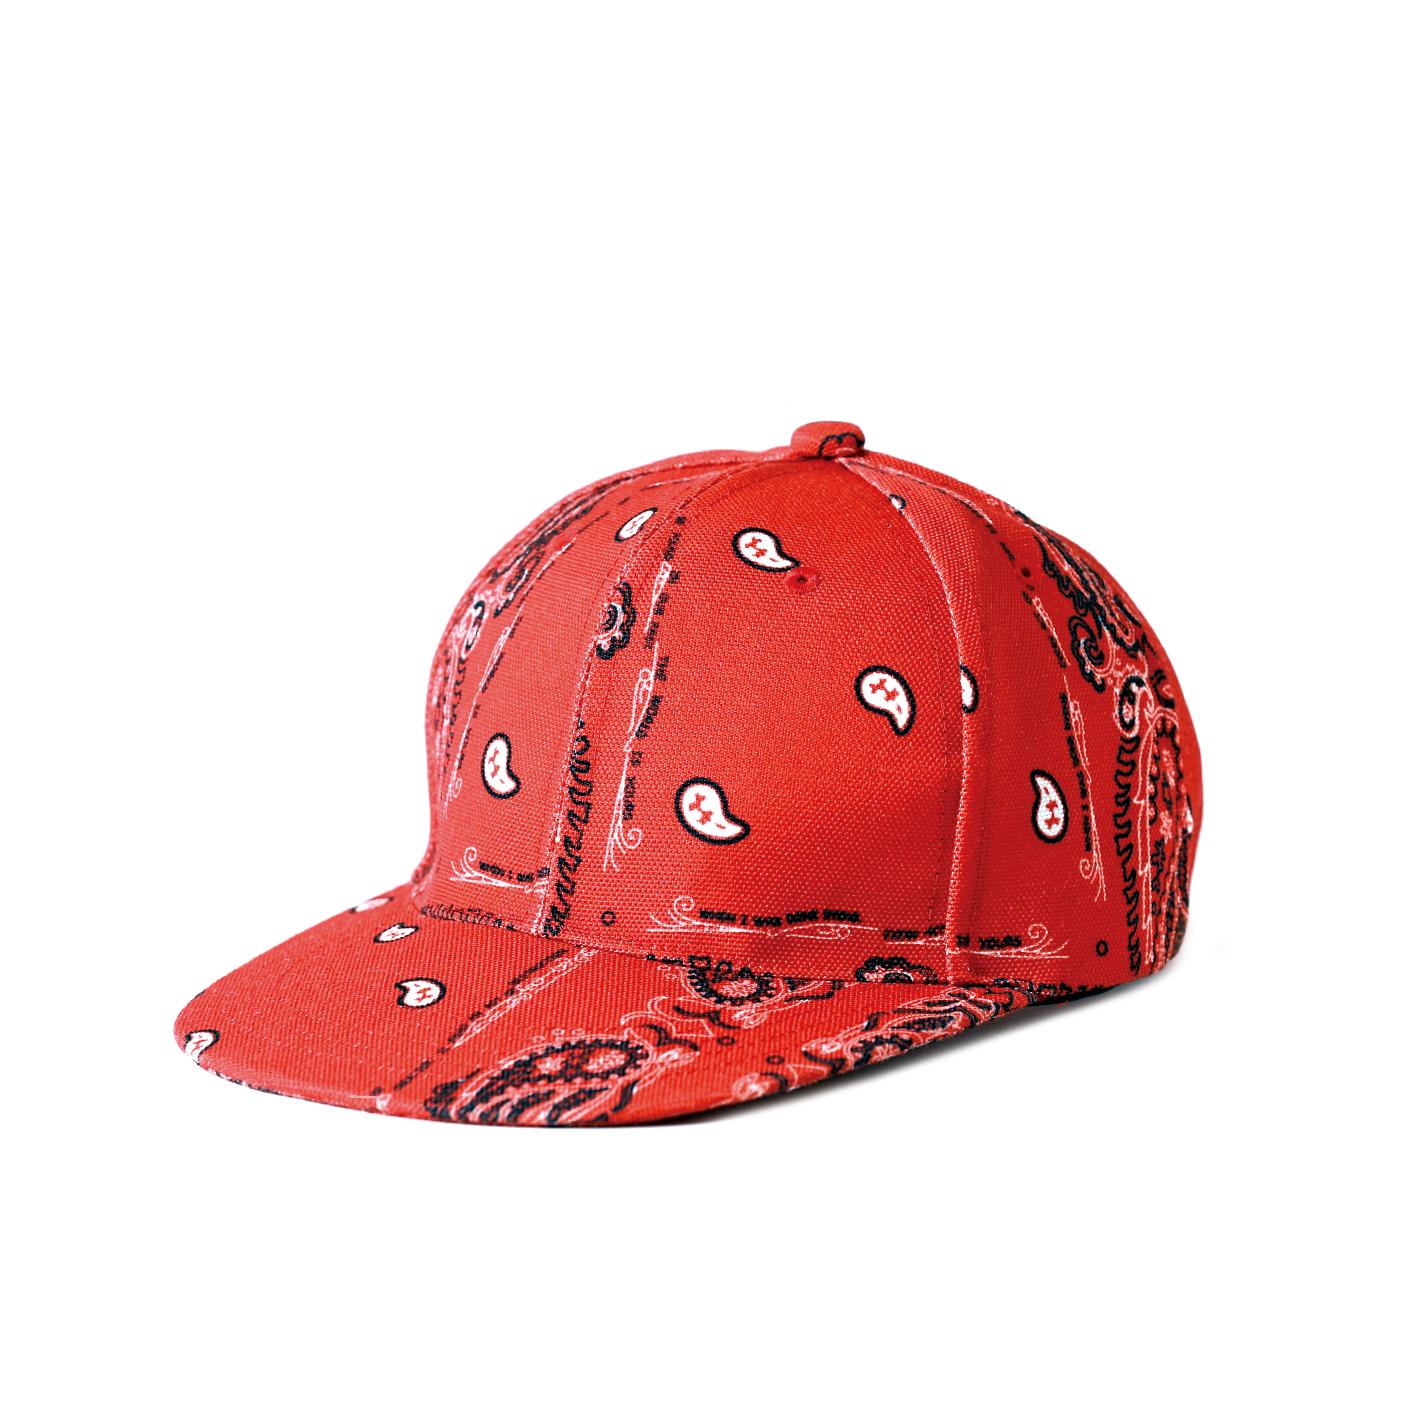 paisleycap_red1